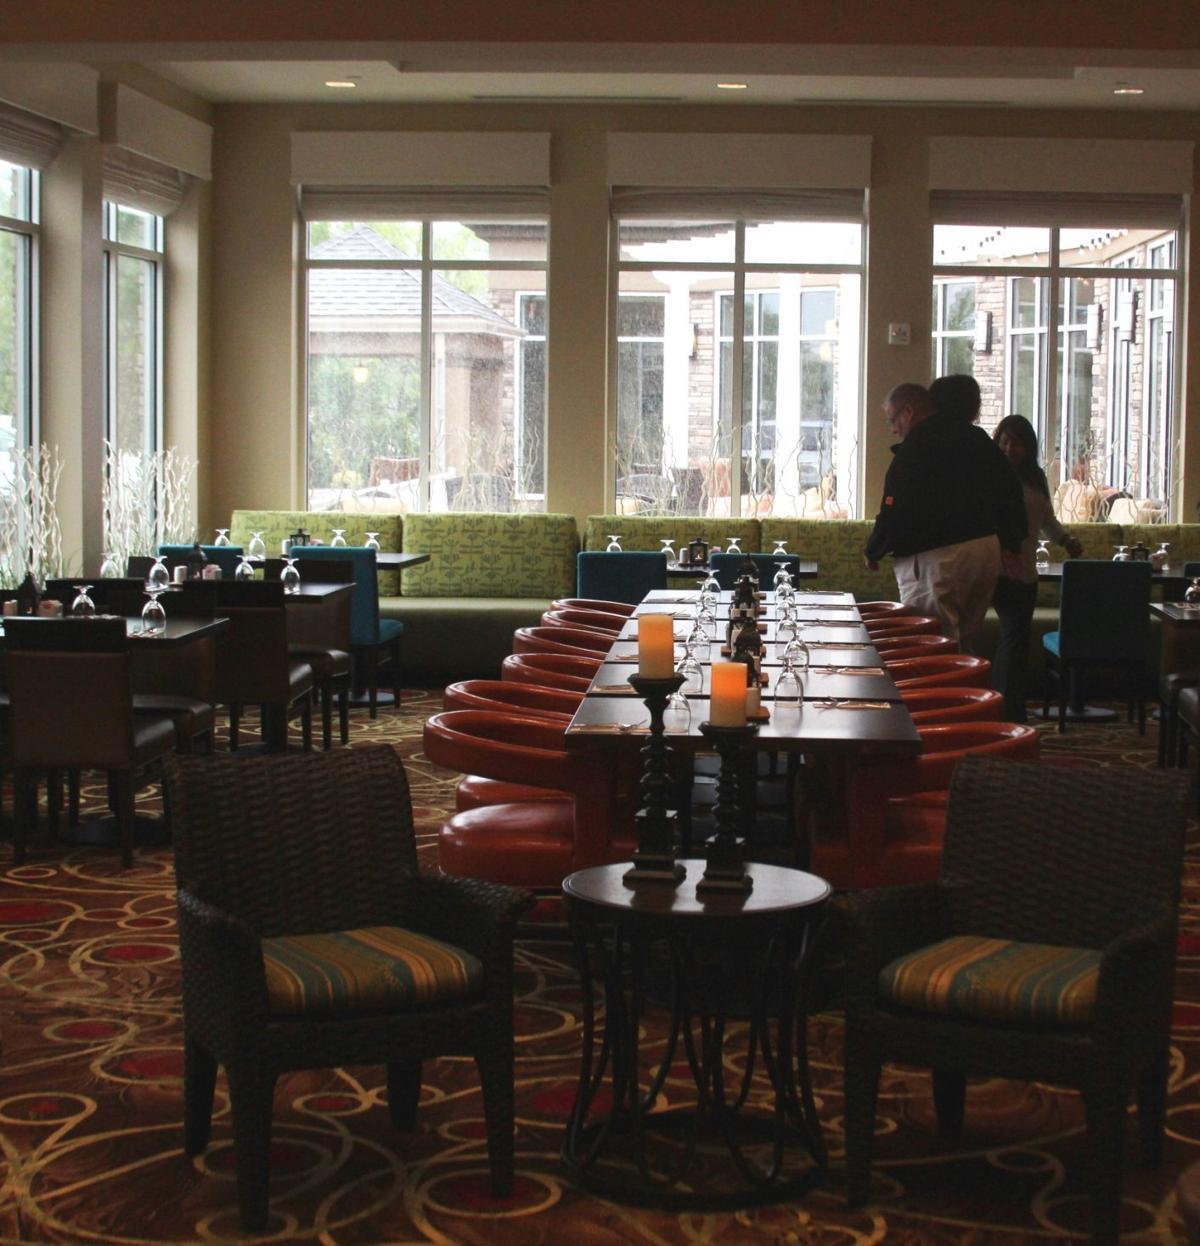 Hilton Garden Inn Joins Middle Road Lineup Economy